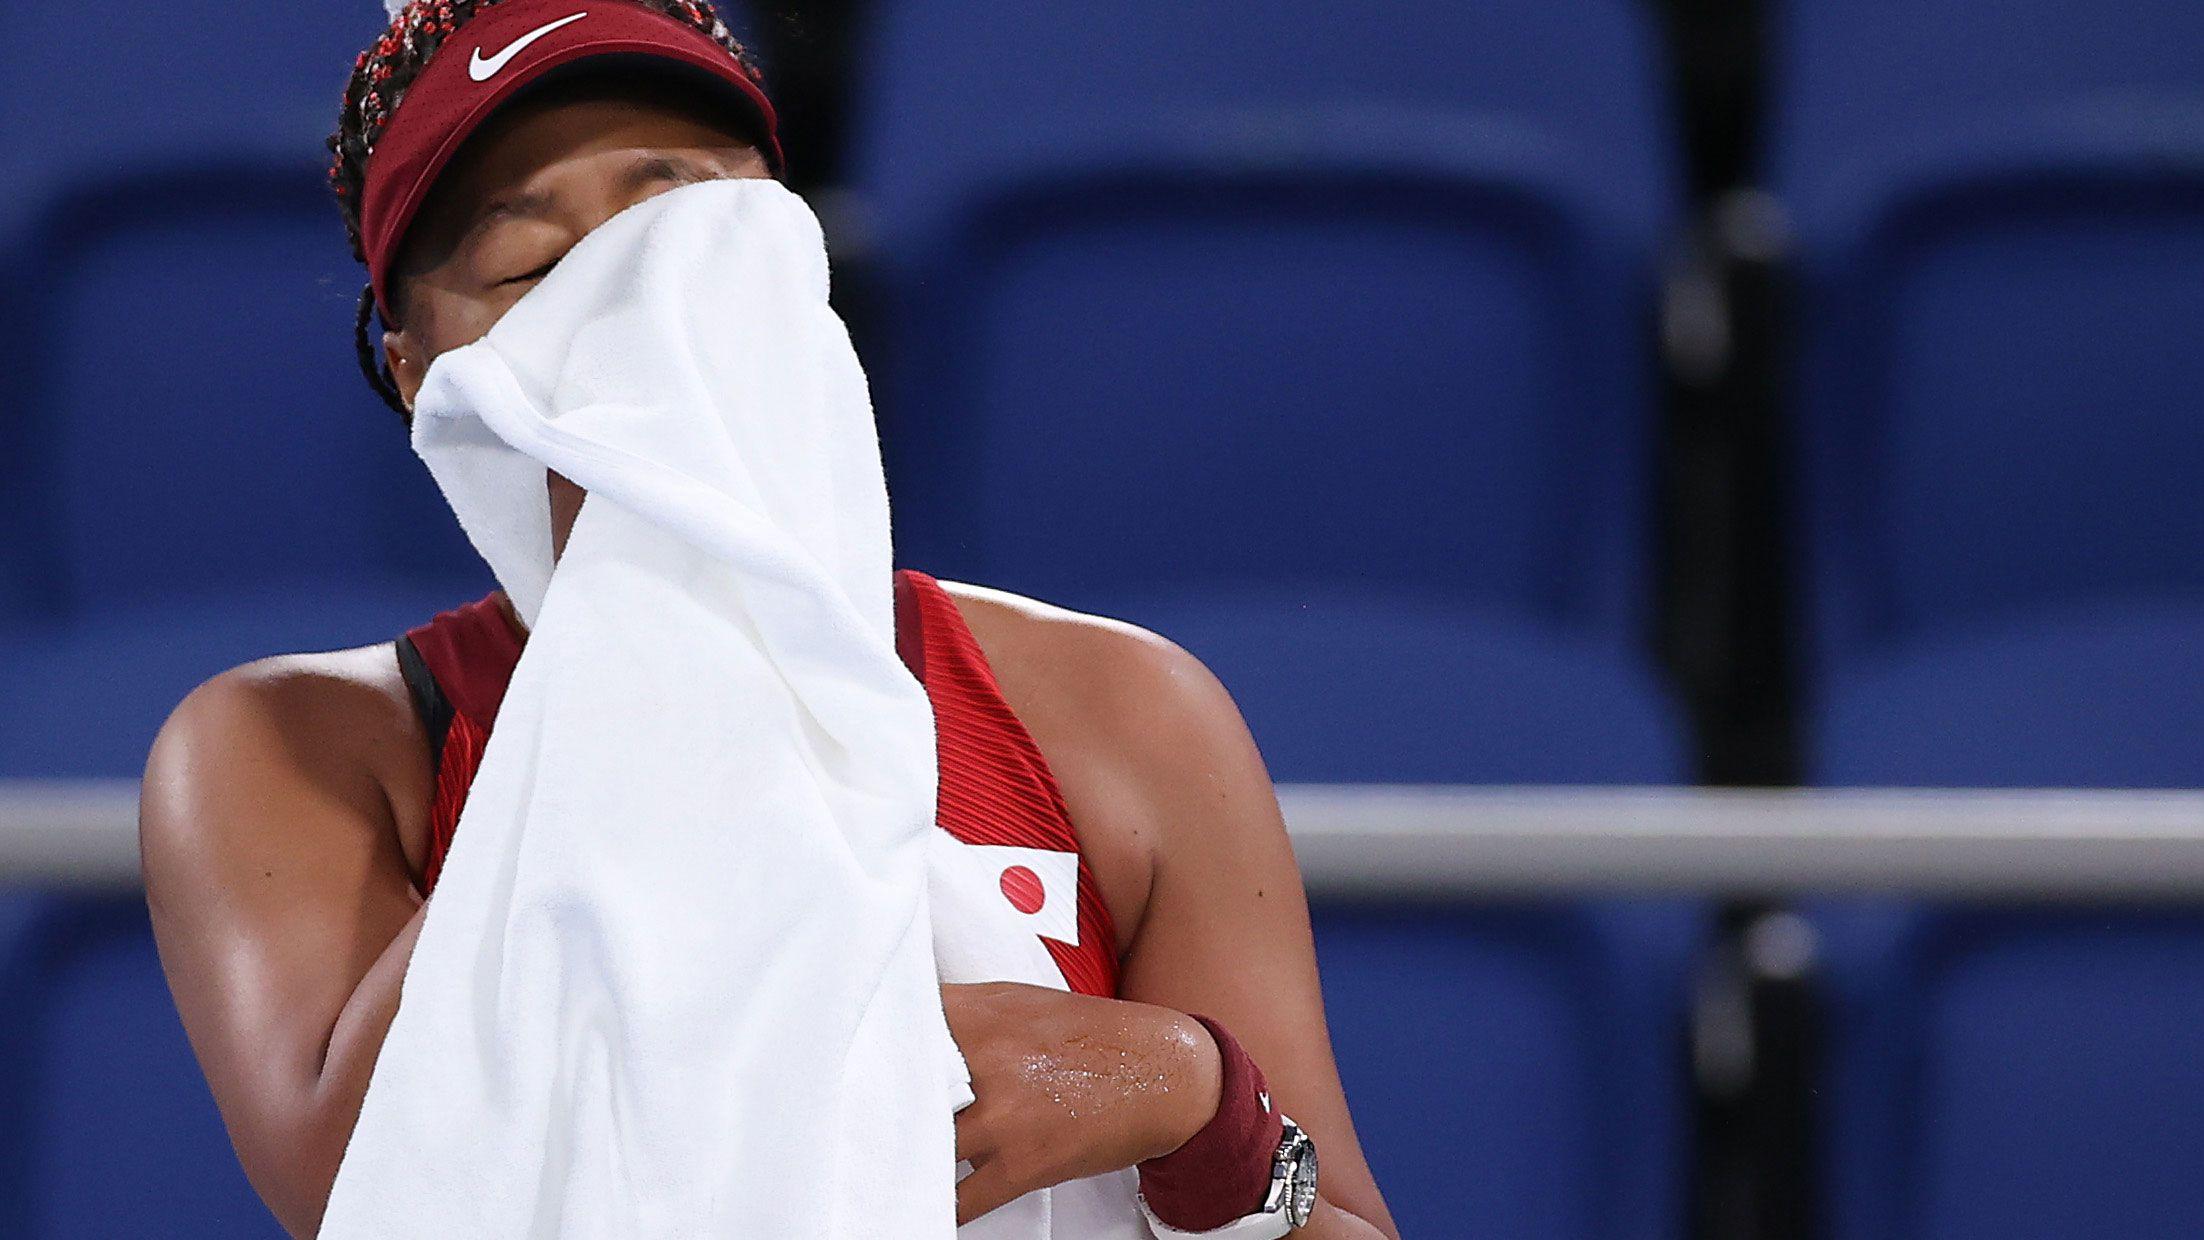 Tokyo Olympics 2021: Devastated Naomi Osaka crashes out in straight sets to world No.42